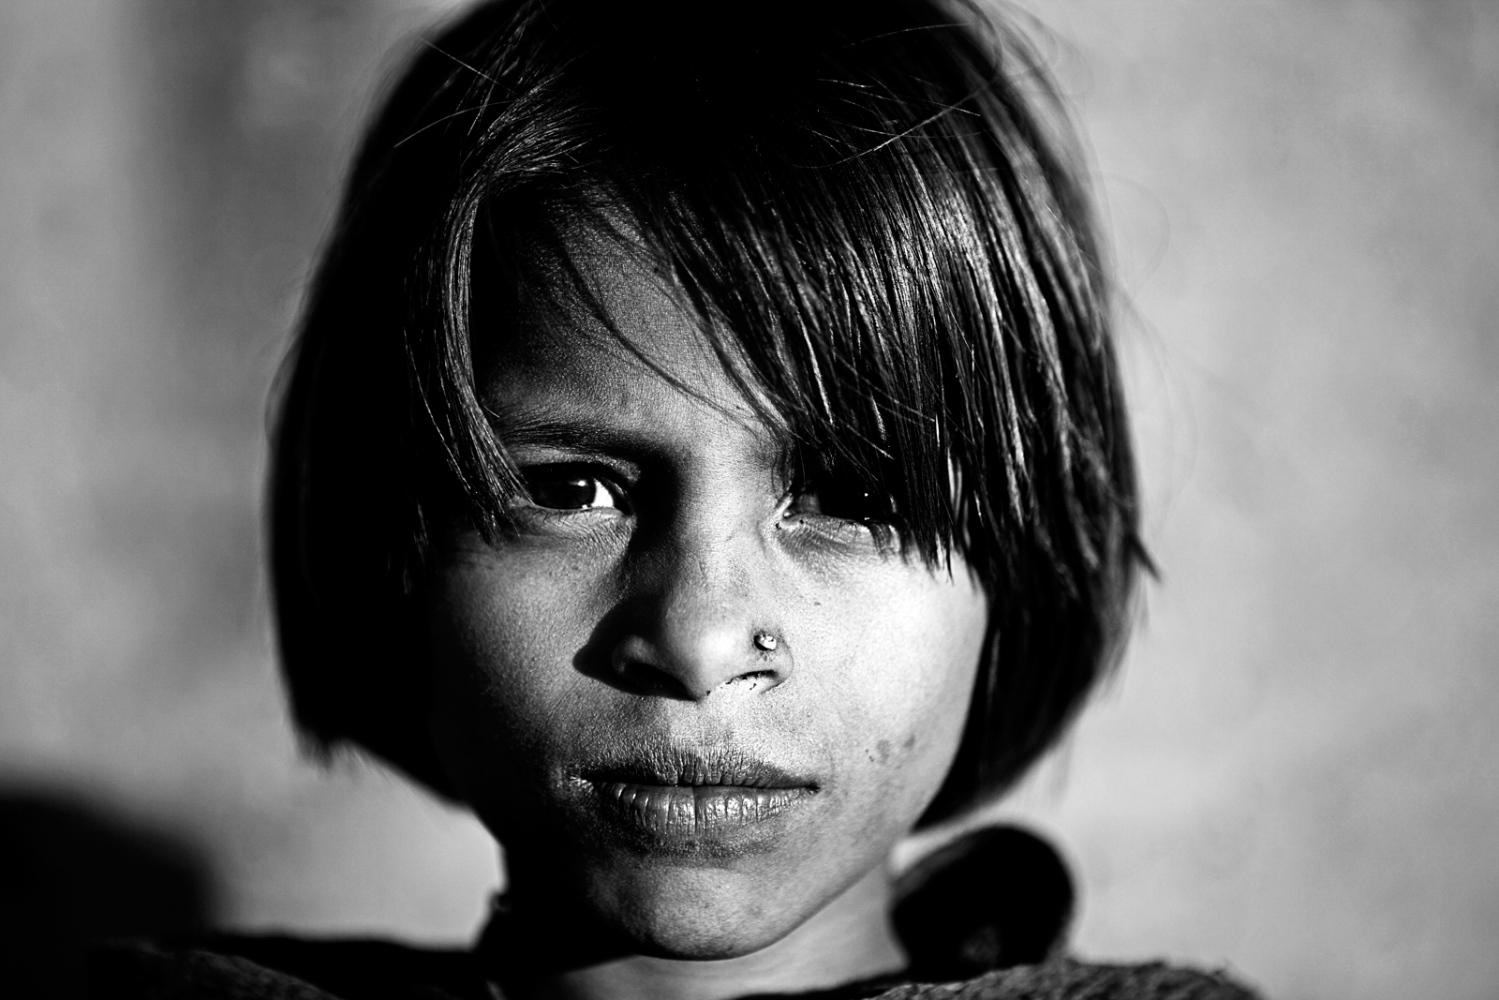 Lali, Rajastham 2012 Palu's older sister.